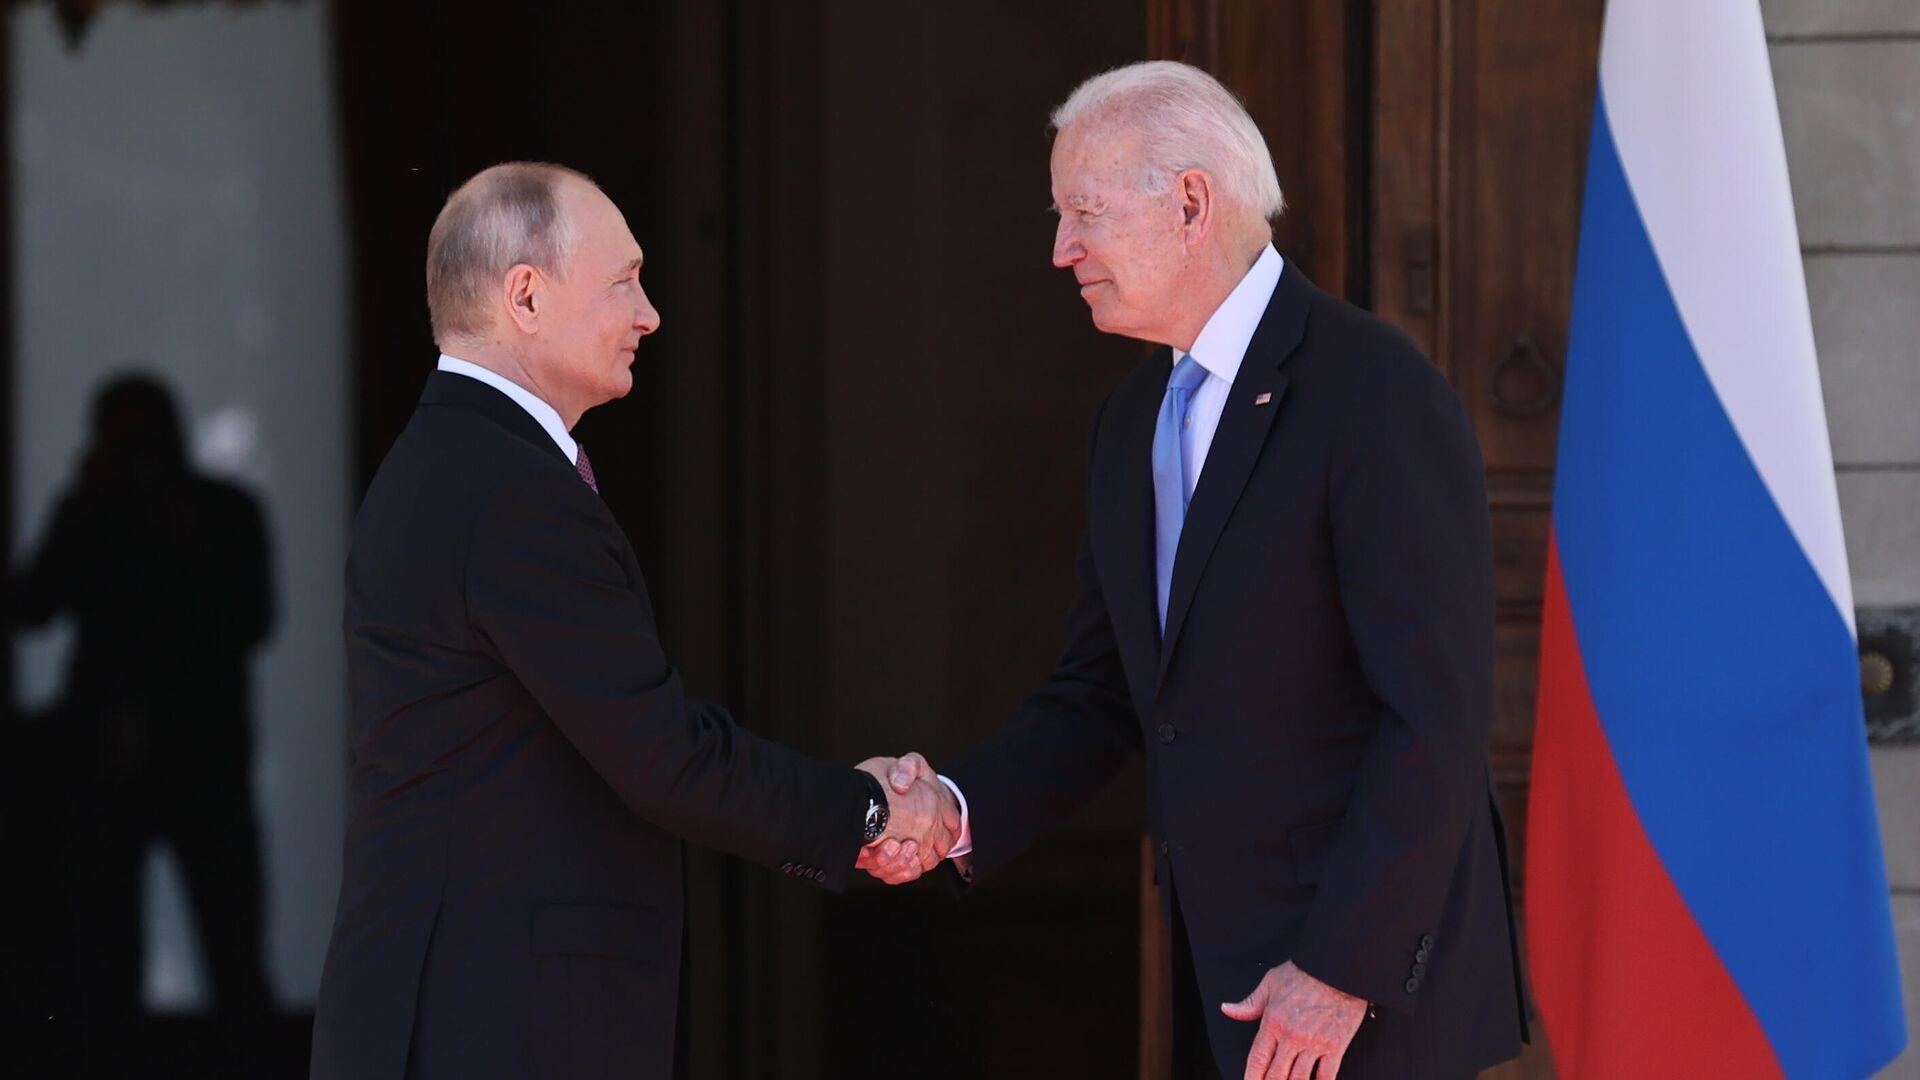 Президент РФ Владимир Путин и президент США Джо Байден во время встречи в Женеве на вилле Ла Гранж - РИА Новости, 1920, 18.06.2021